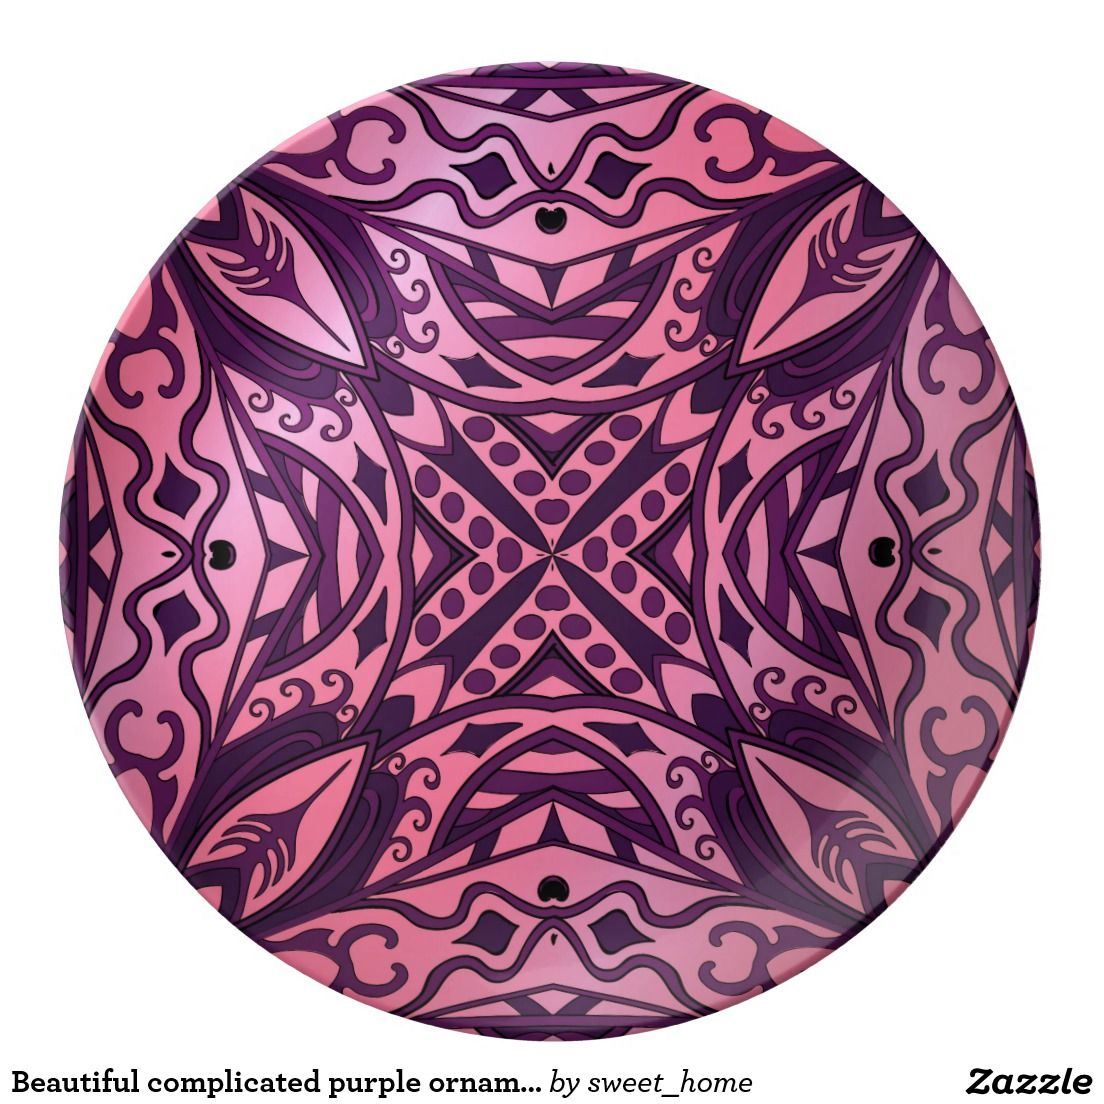 Beautiful complicated purple ornament dinner plate  Moroccan ornament for bedroom make interior unique and add aesthetics sense. Ornament create in oriental tradition. #Home #decor #Room #accessories #Interior #decorating #Idea #Styles #abstract